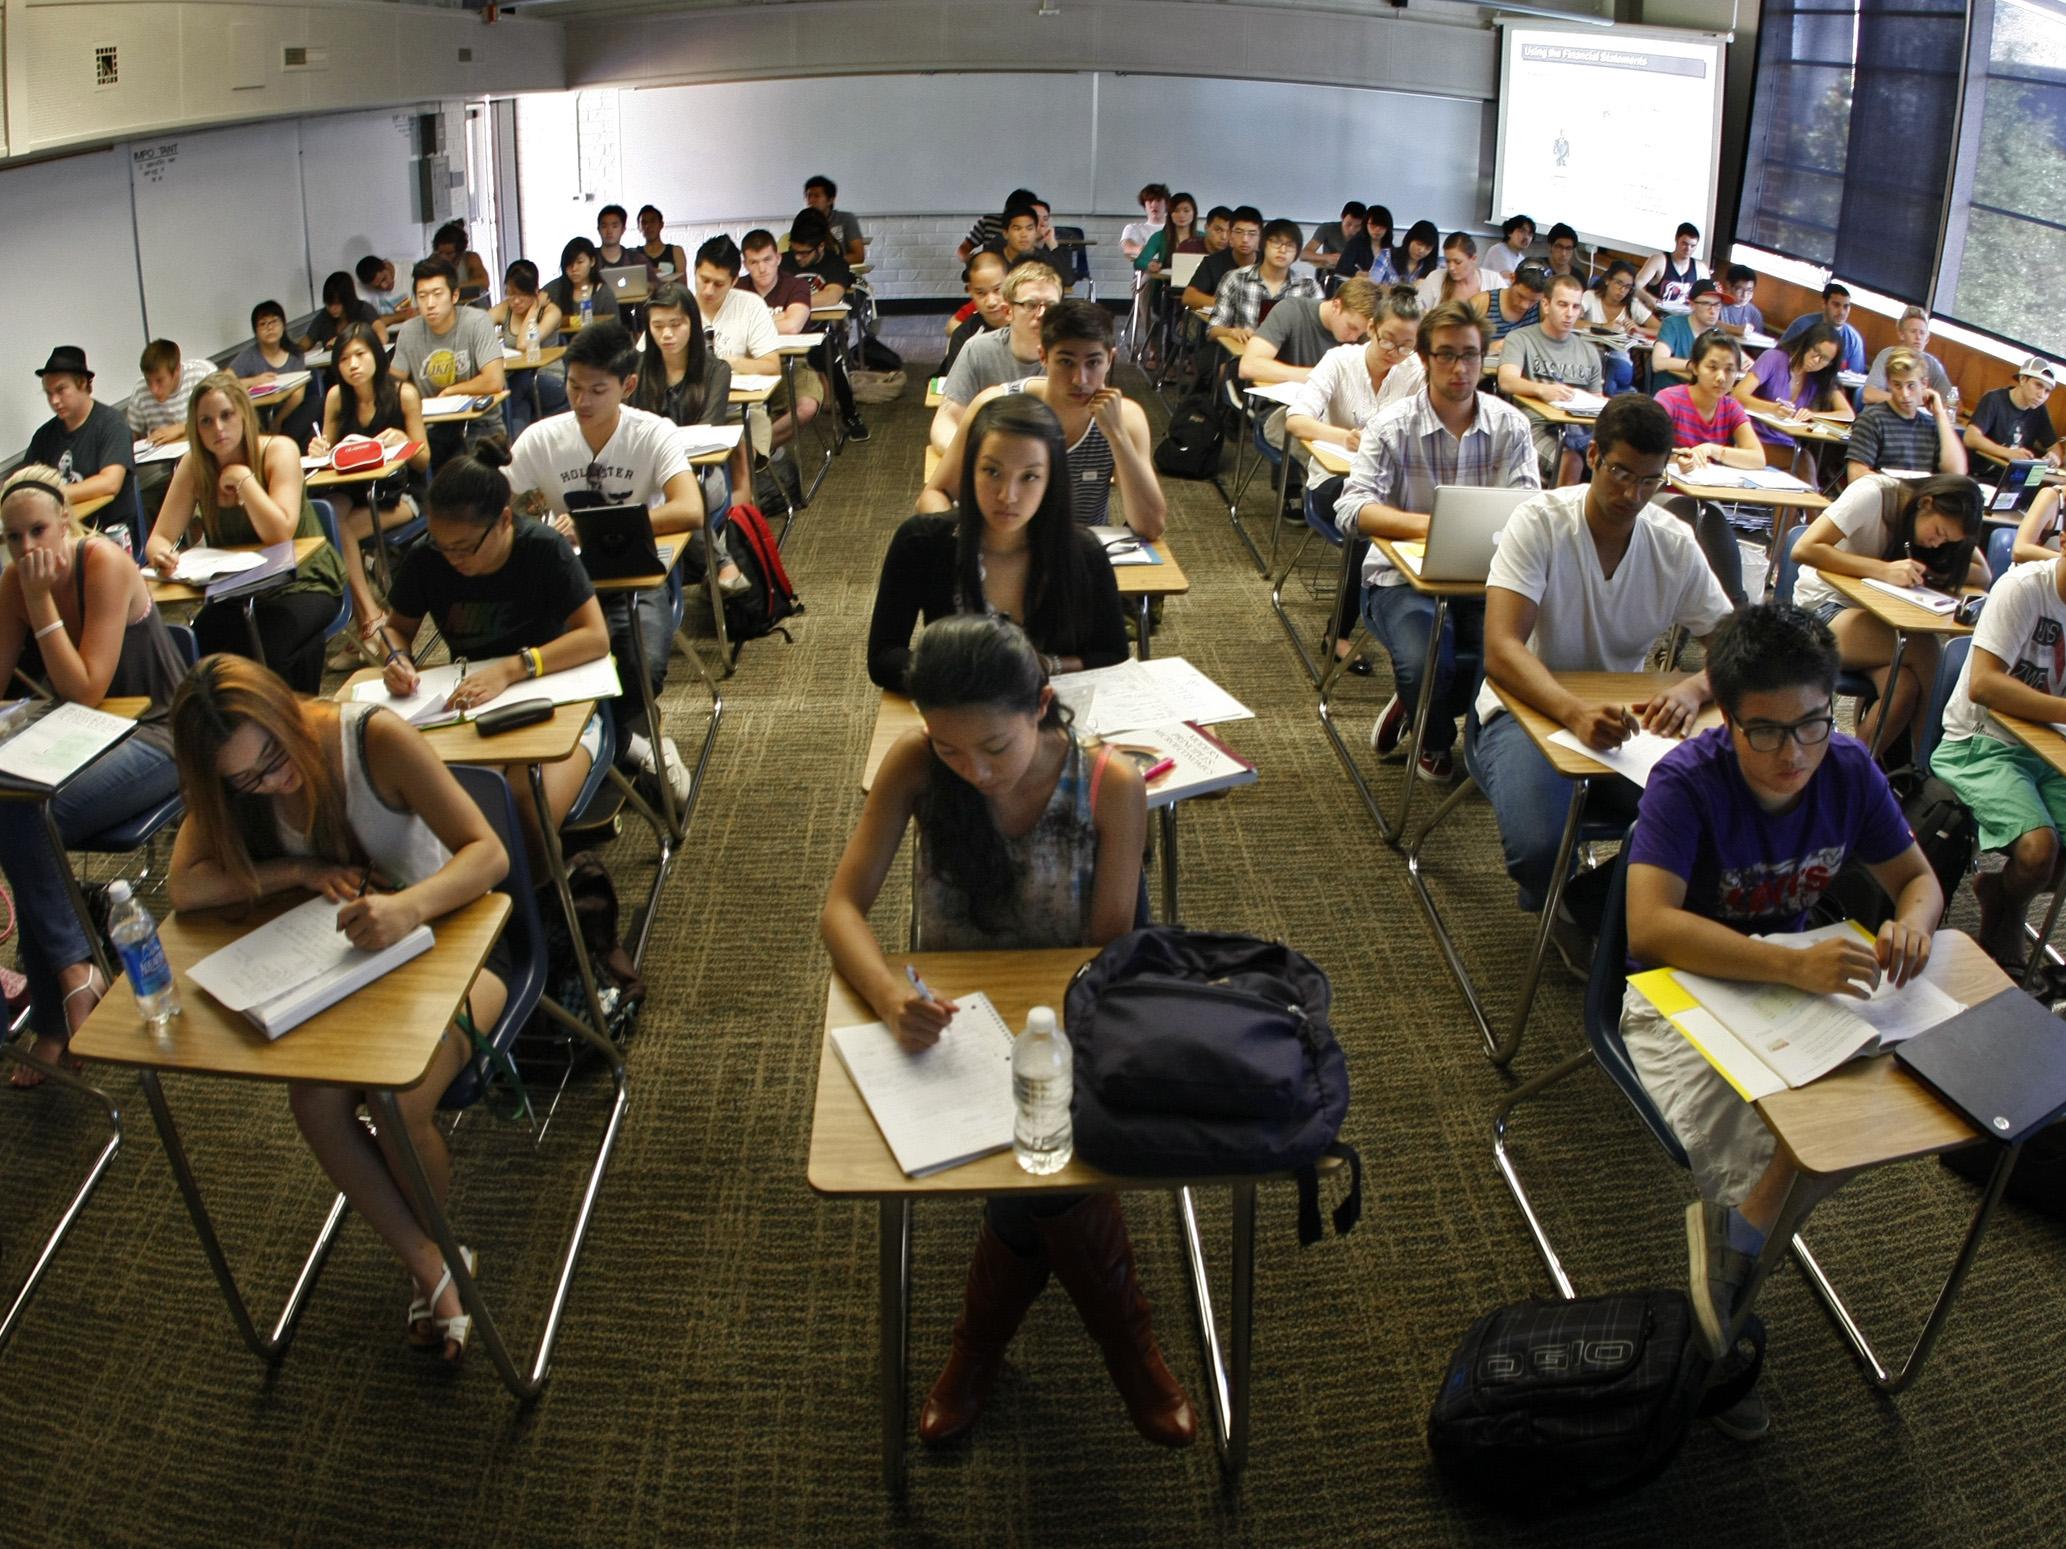 SEPTEMBER 10 2012. COSTA MESA, CA. Every desk is taken in professor Jeanne (cq) Neil's Accounting 10